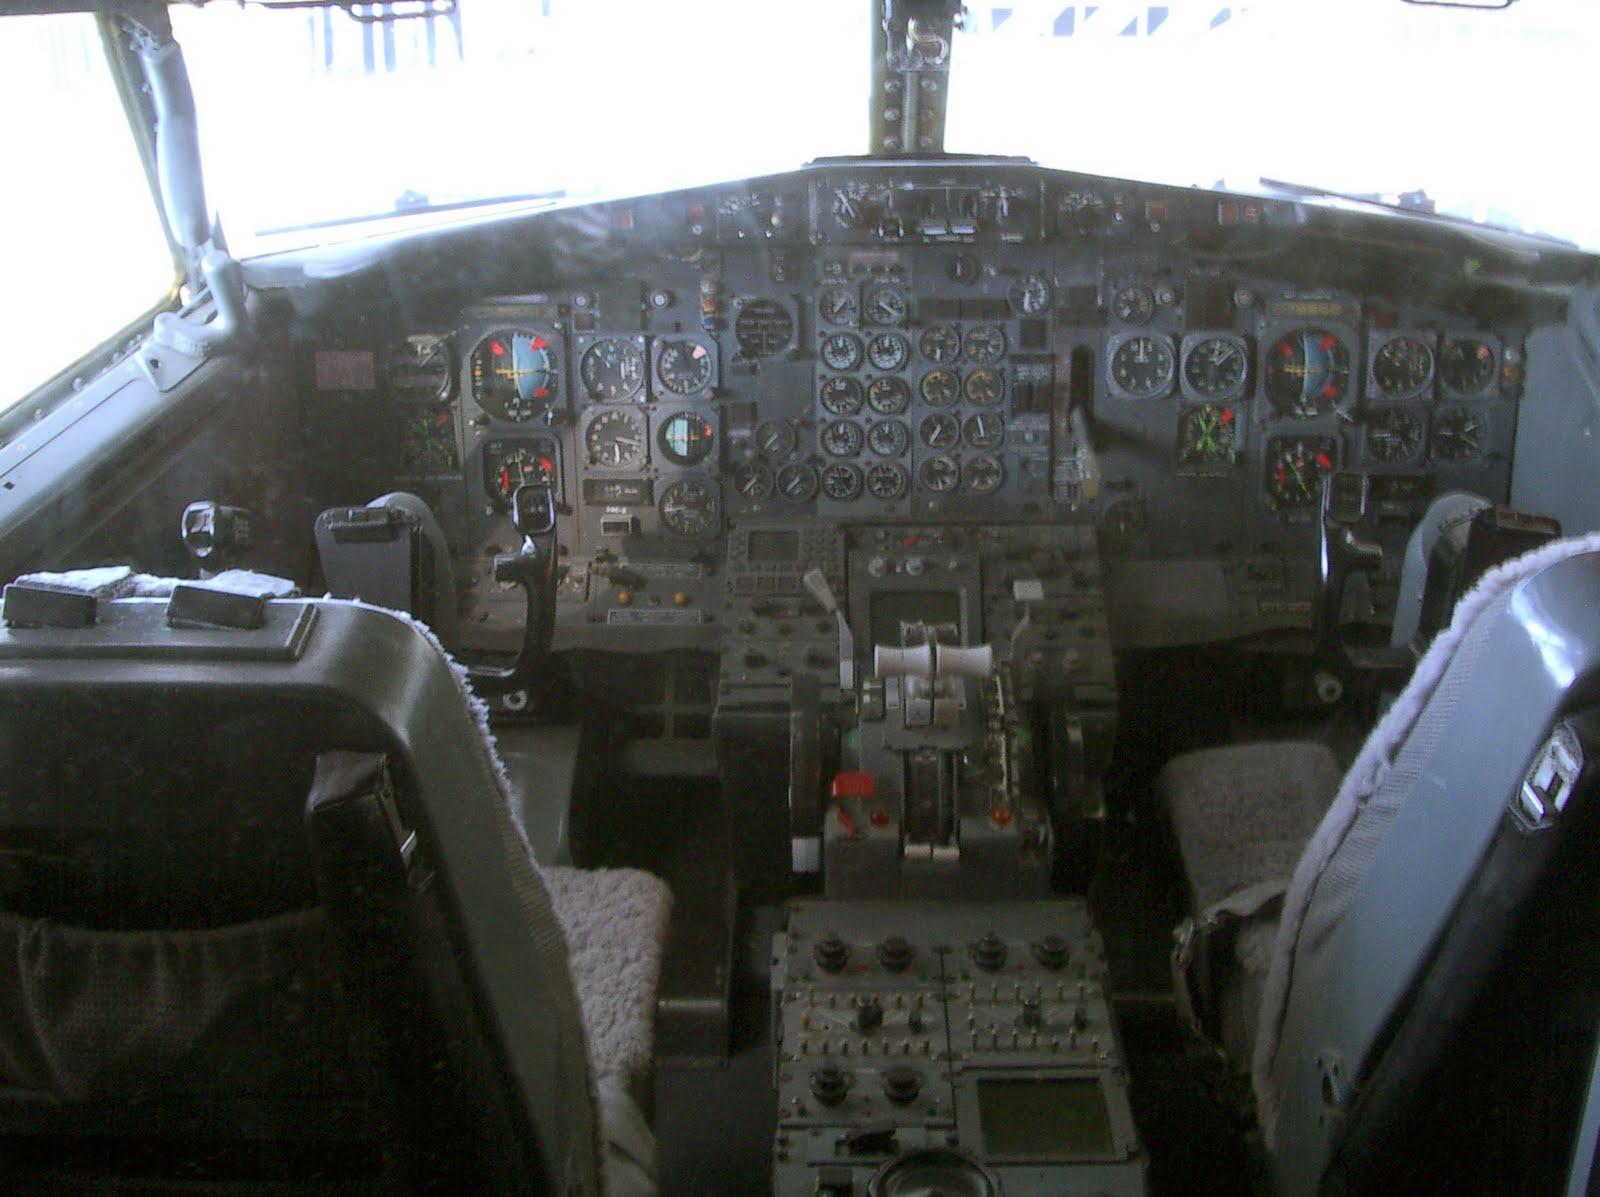 http://3.bp.blogspot.com/-DyFuyoC8FPU/Tjx45k60jpI/AAAAAAAABFo/9yMUCYcacI0/s1600/Boeing+737+Cockpit+Pictures+%25284%2529.jpg